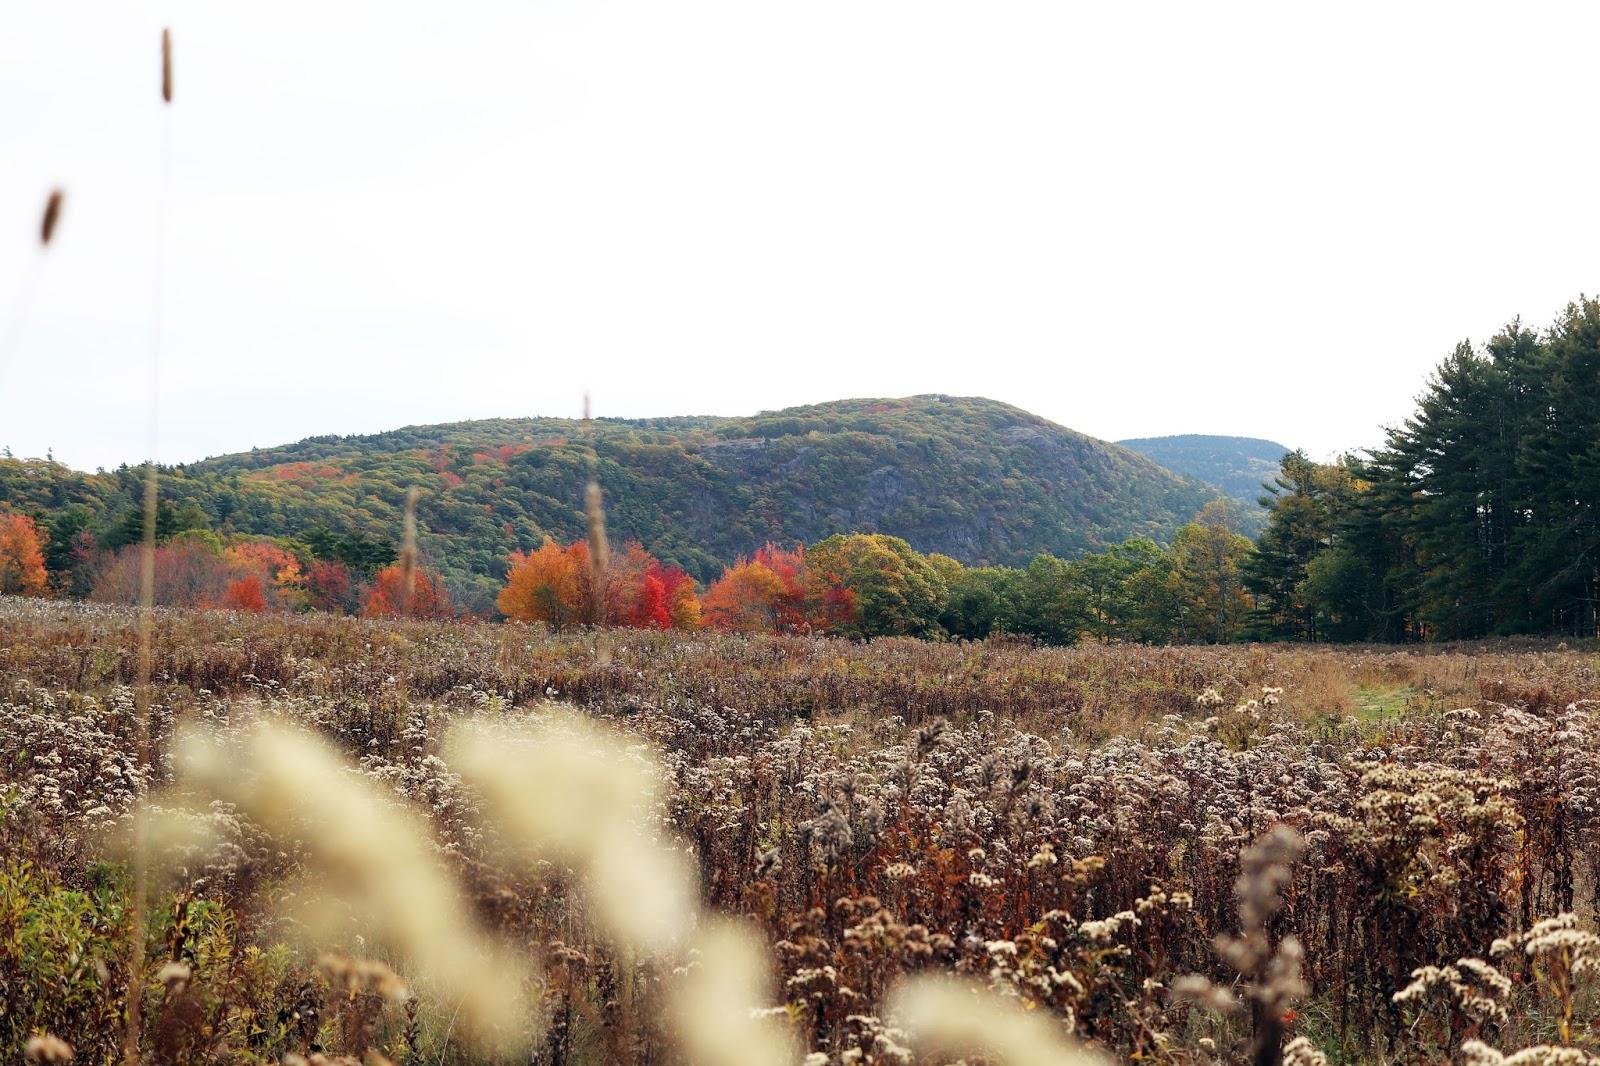 fernald's neck preserve, lincolnville maine, camden maine